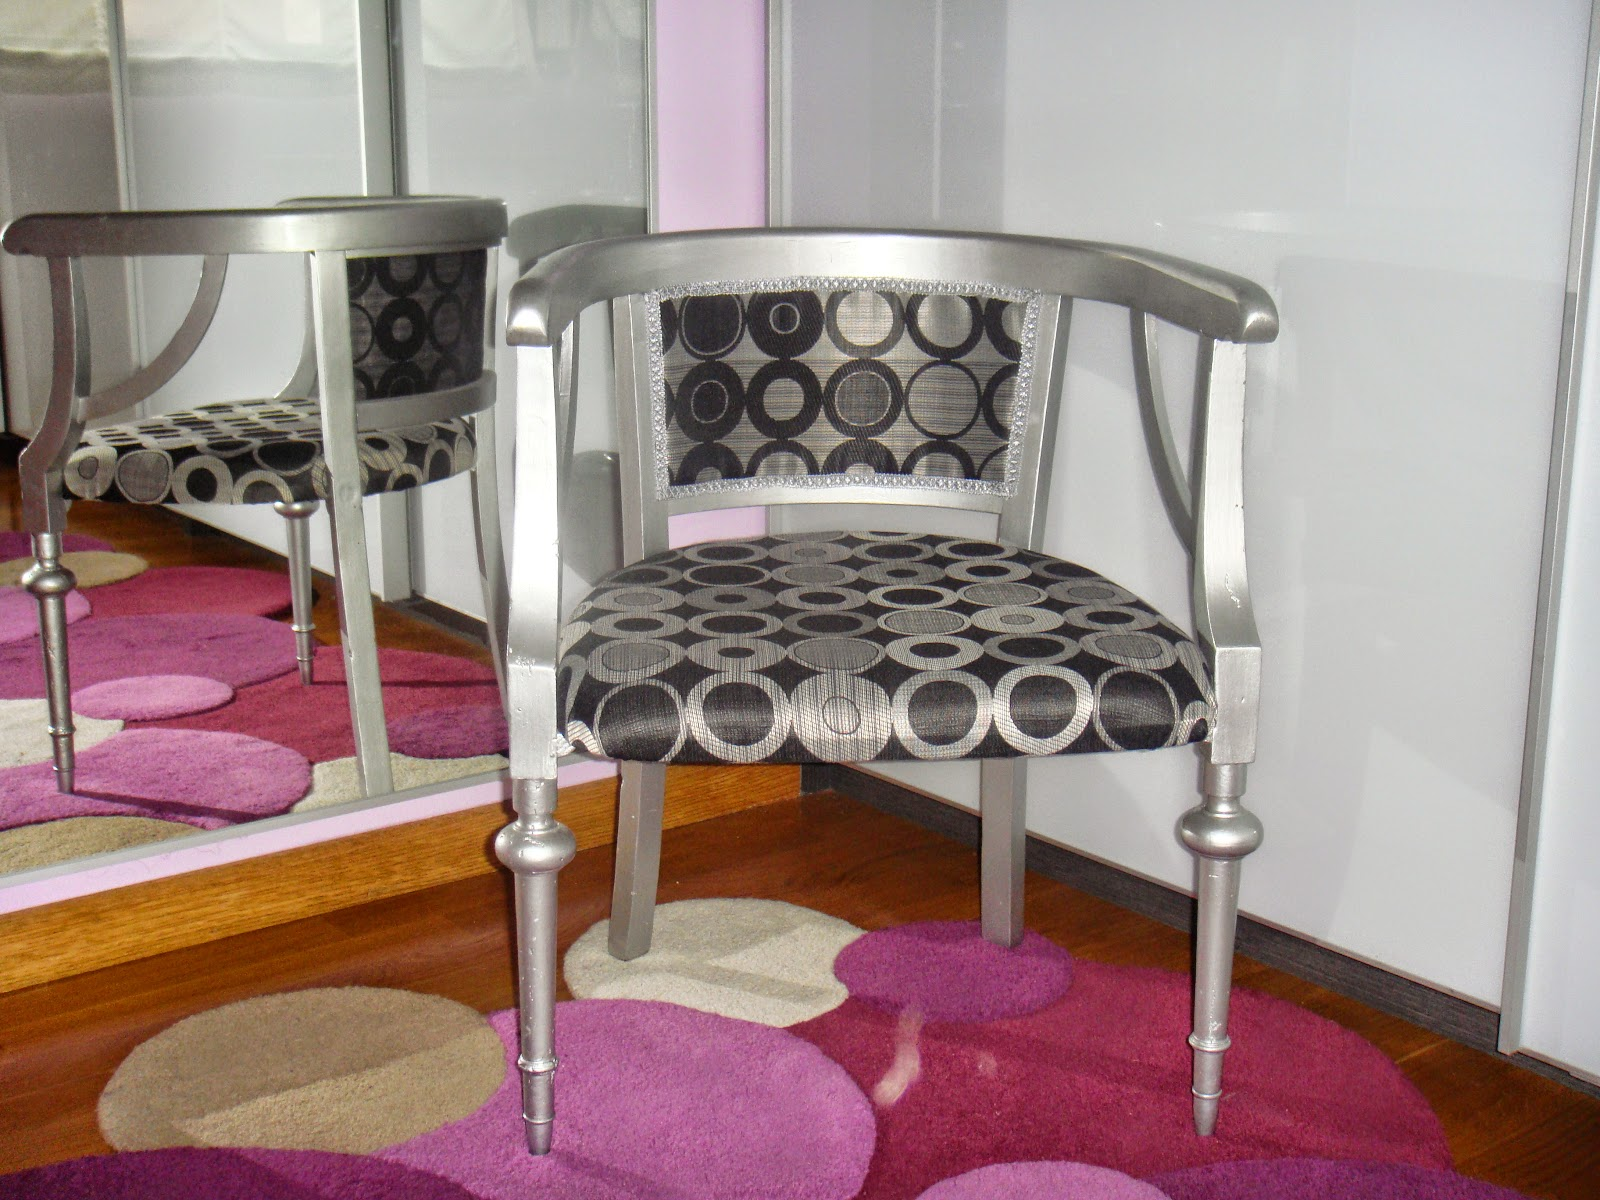 Detr s de mi puerta restauraci n silla centenaria antes - Restauracion de sillas ...